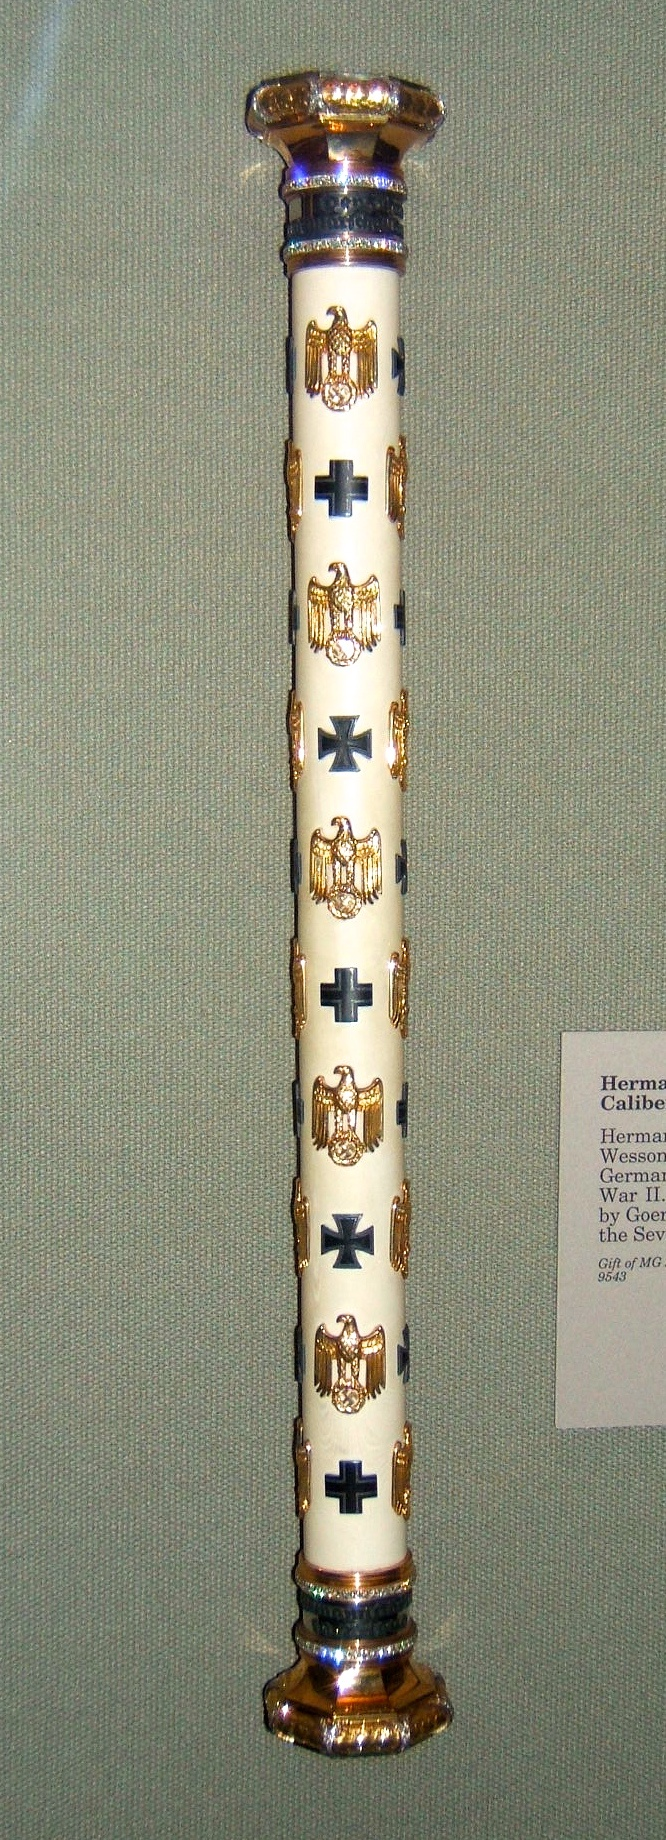 Luftwaffe baton of Generalfeldmarschall Hermann Goering, at the West Point Museum.